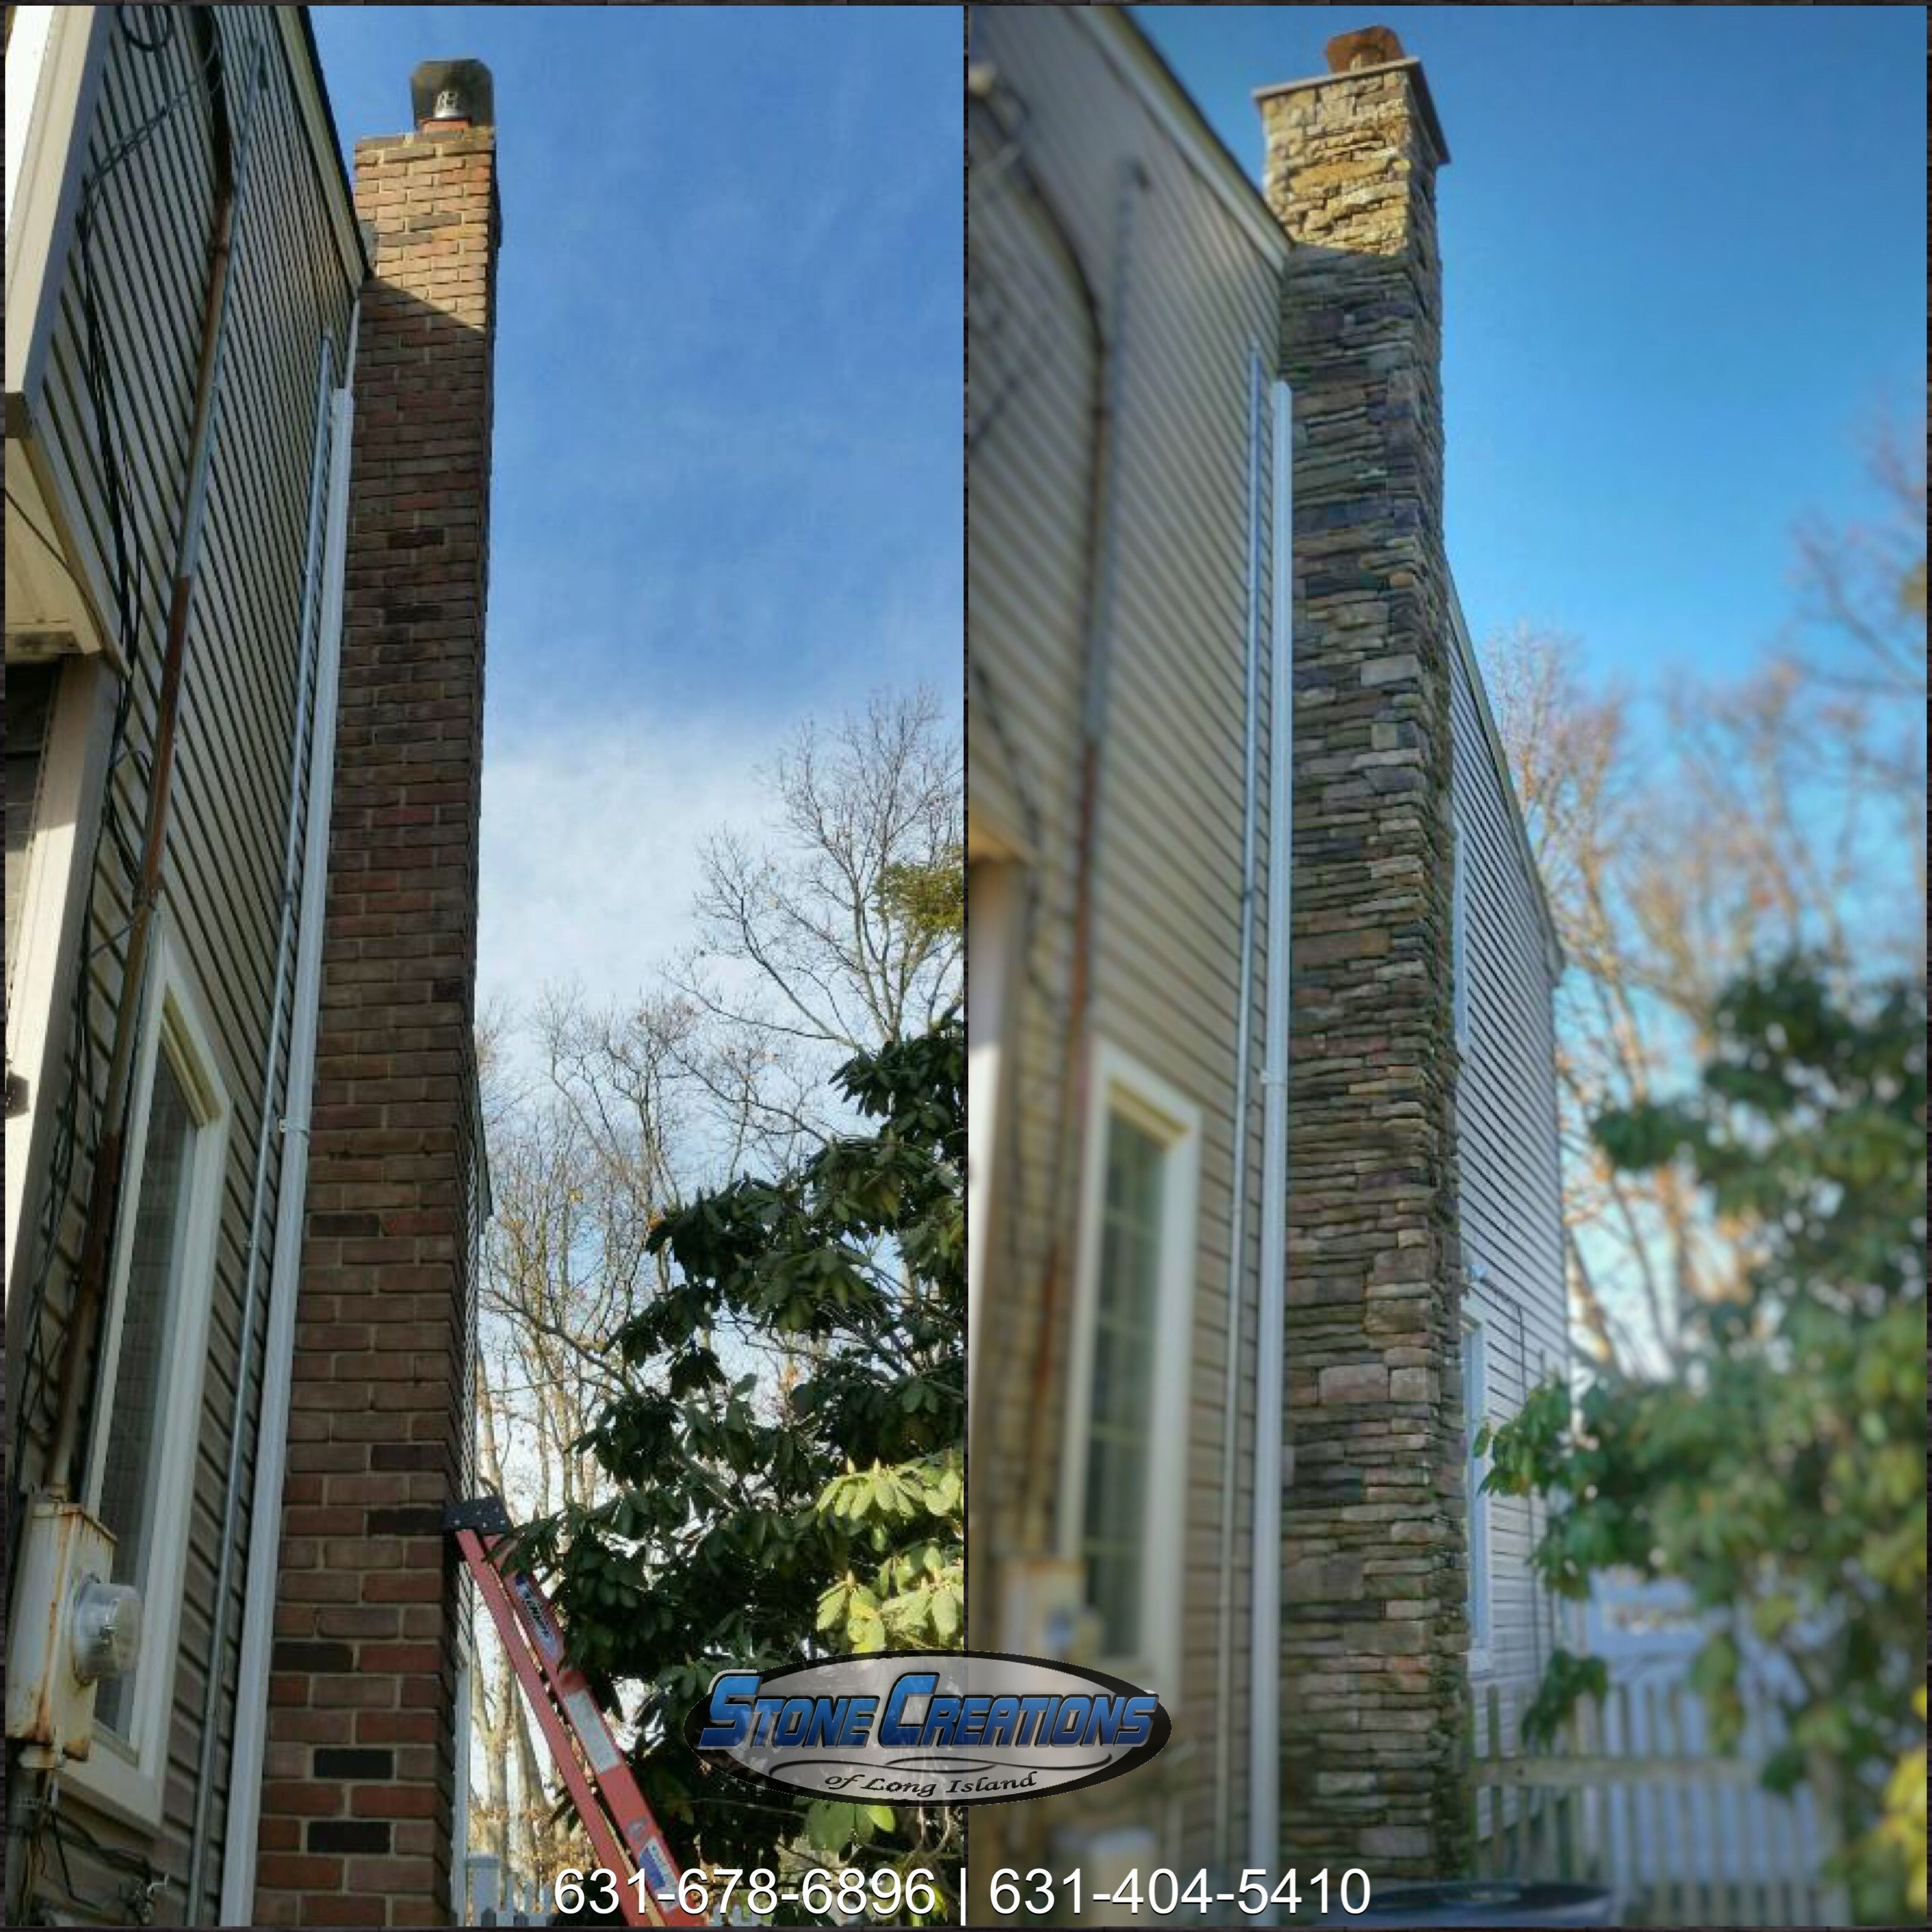 #Cambridgepavers  #Curbappeal - Based In Deer Park Ny 11729